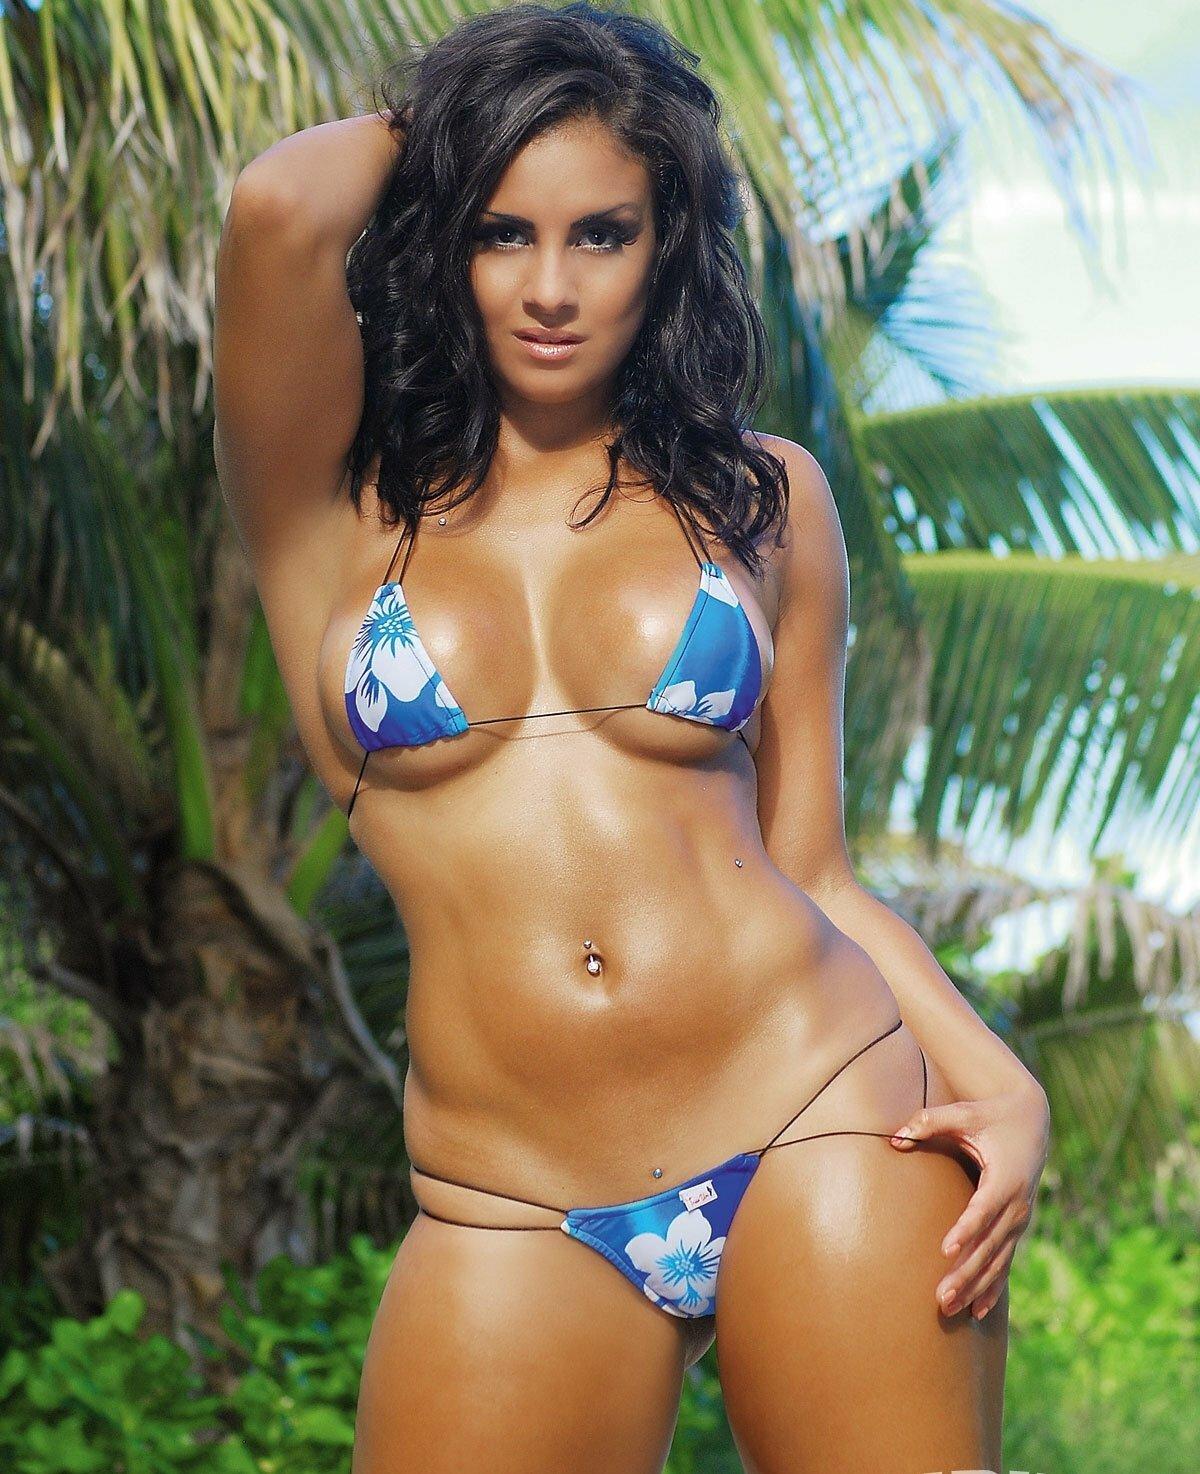 Granny brazilian bikinisxxx girl dallas